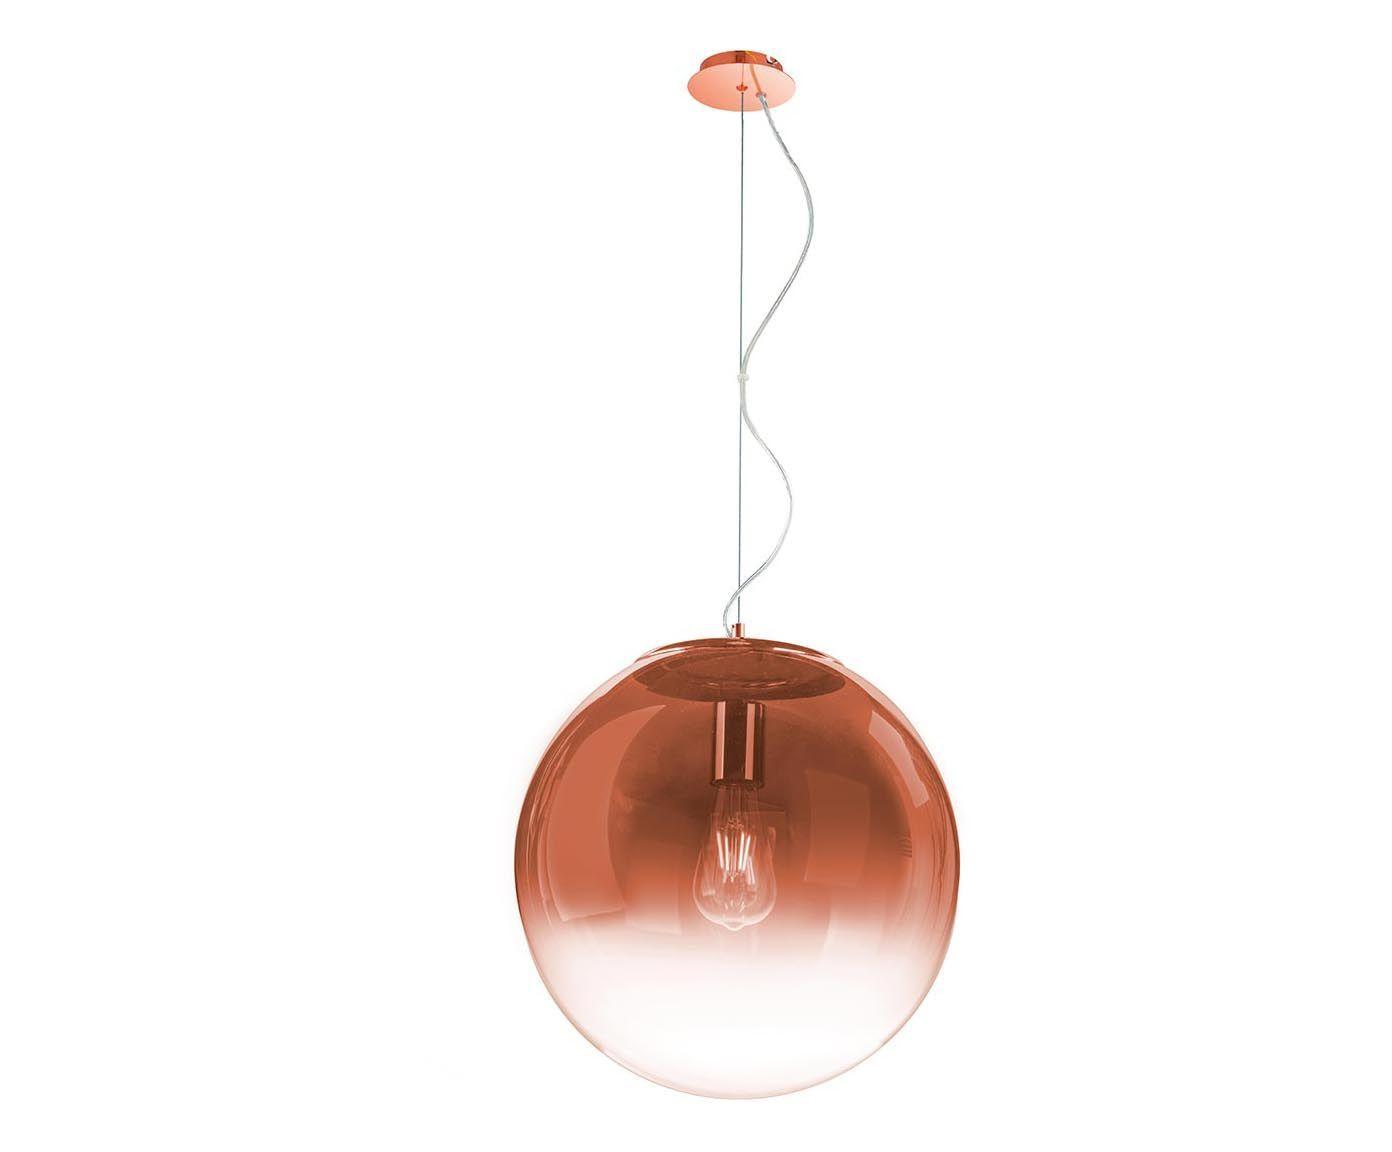 Lampada a sospensione Ball ottone Westwing Lampade